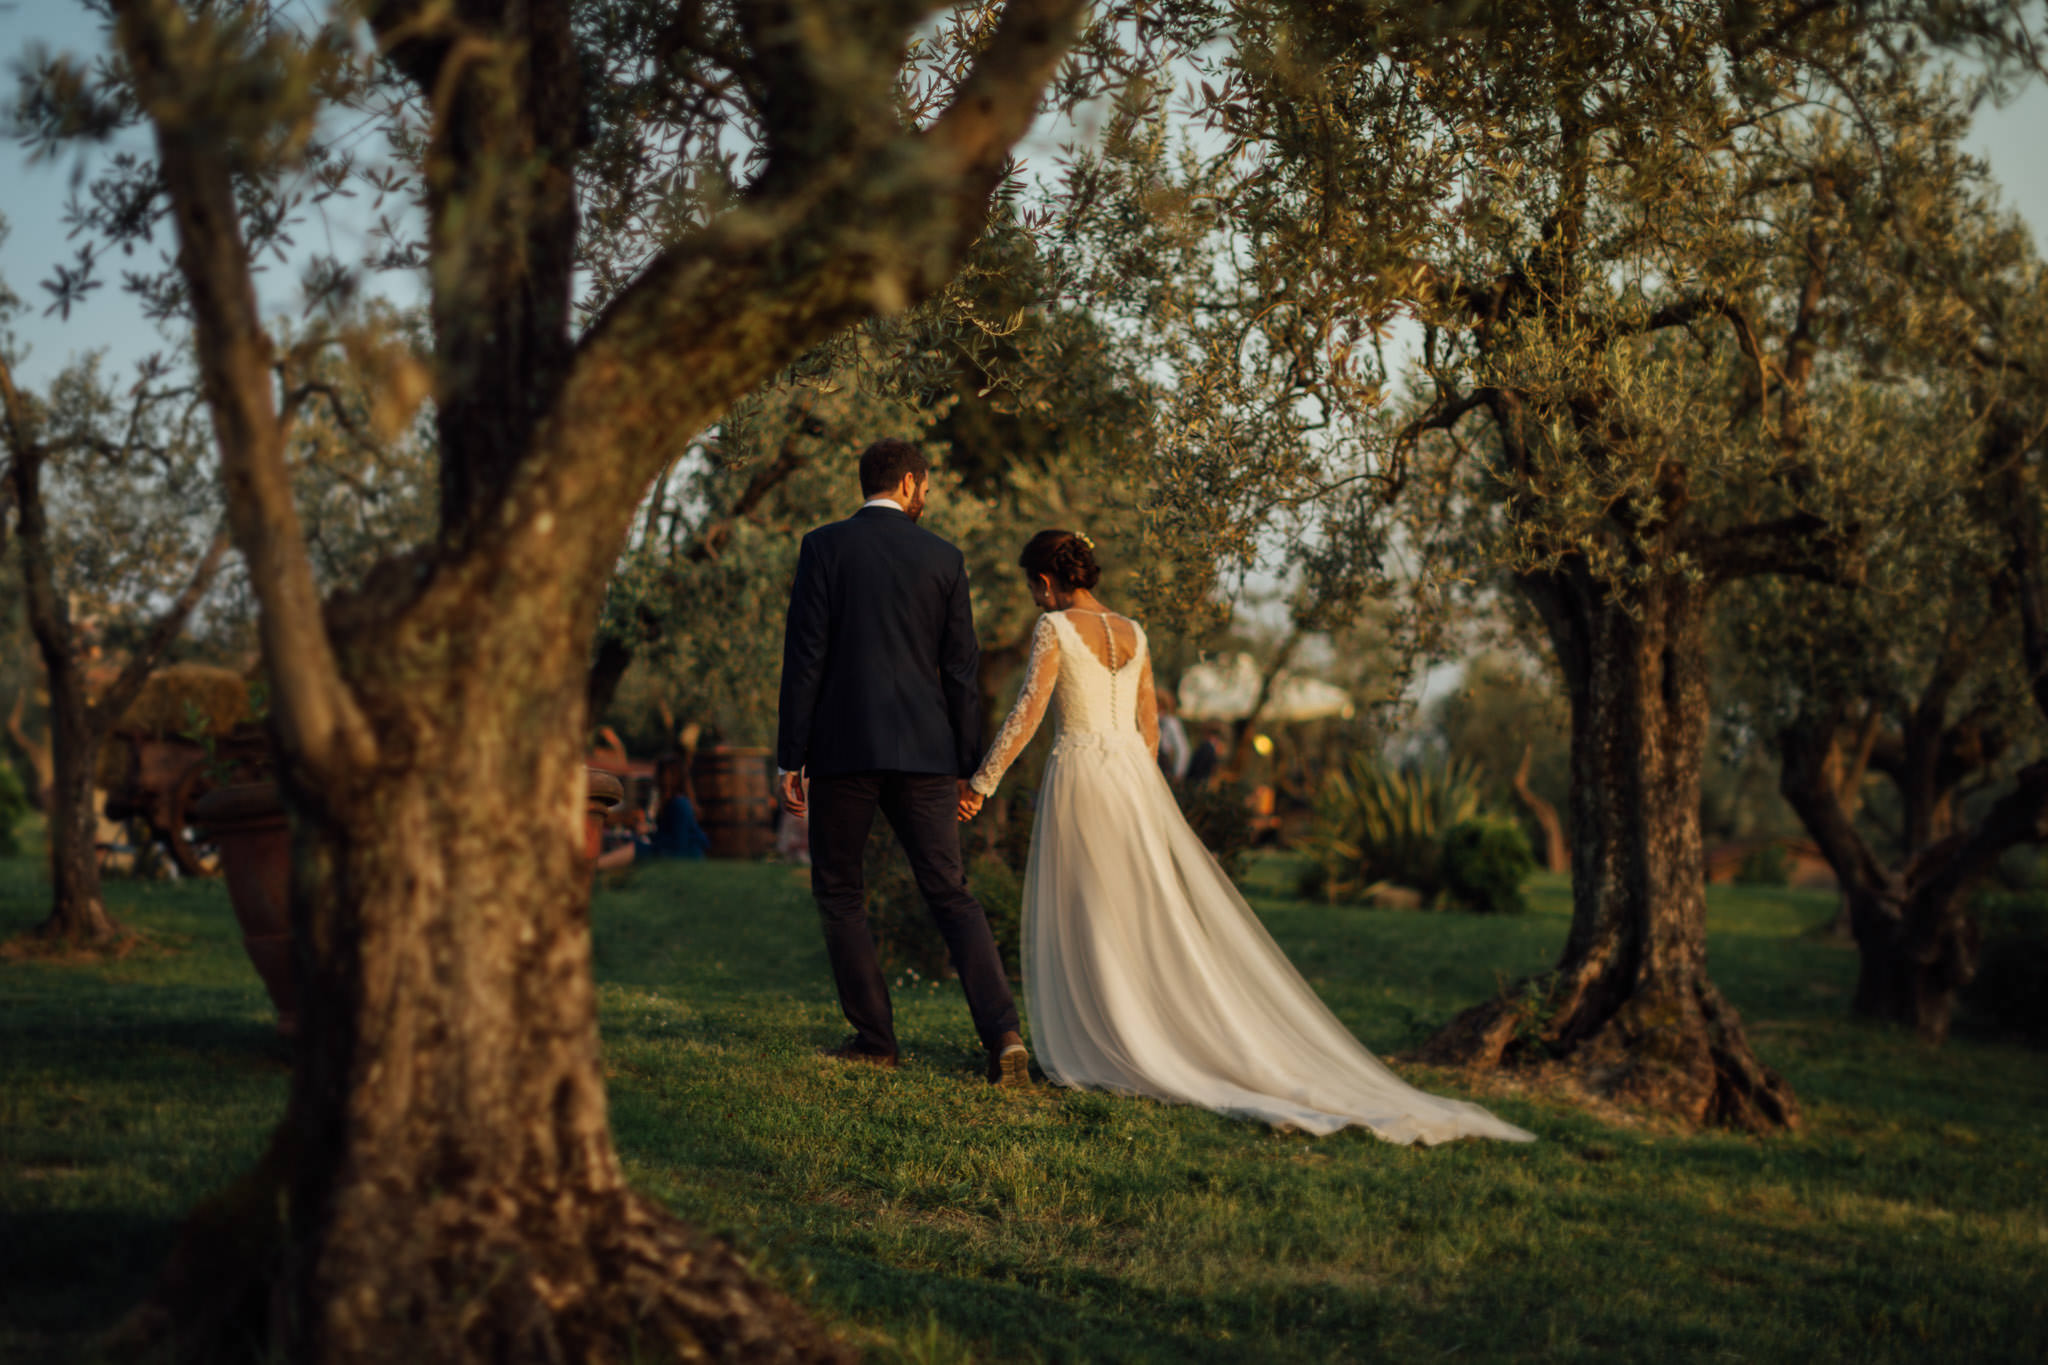 fotografia_di_matrimonio_portfolio-1085